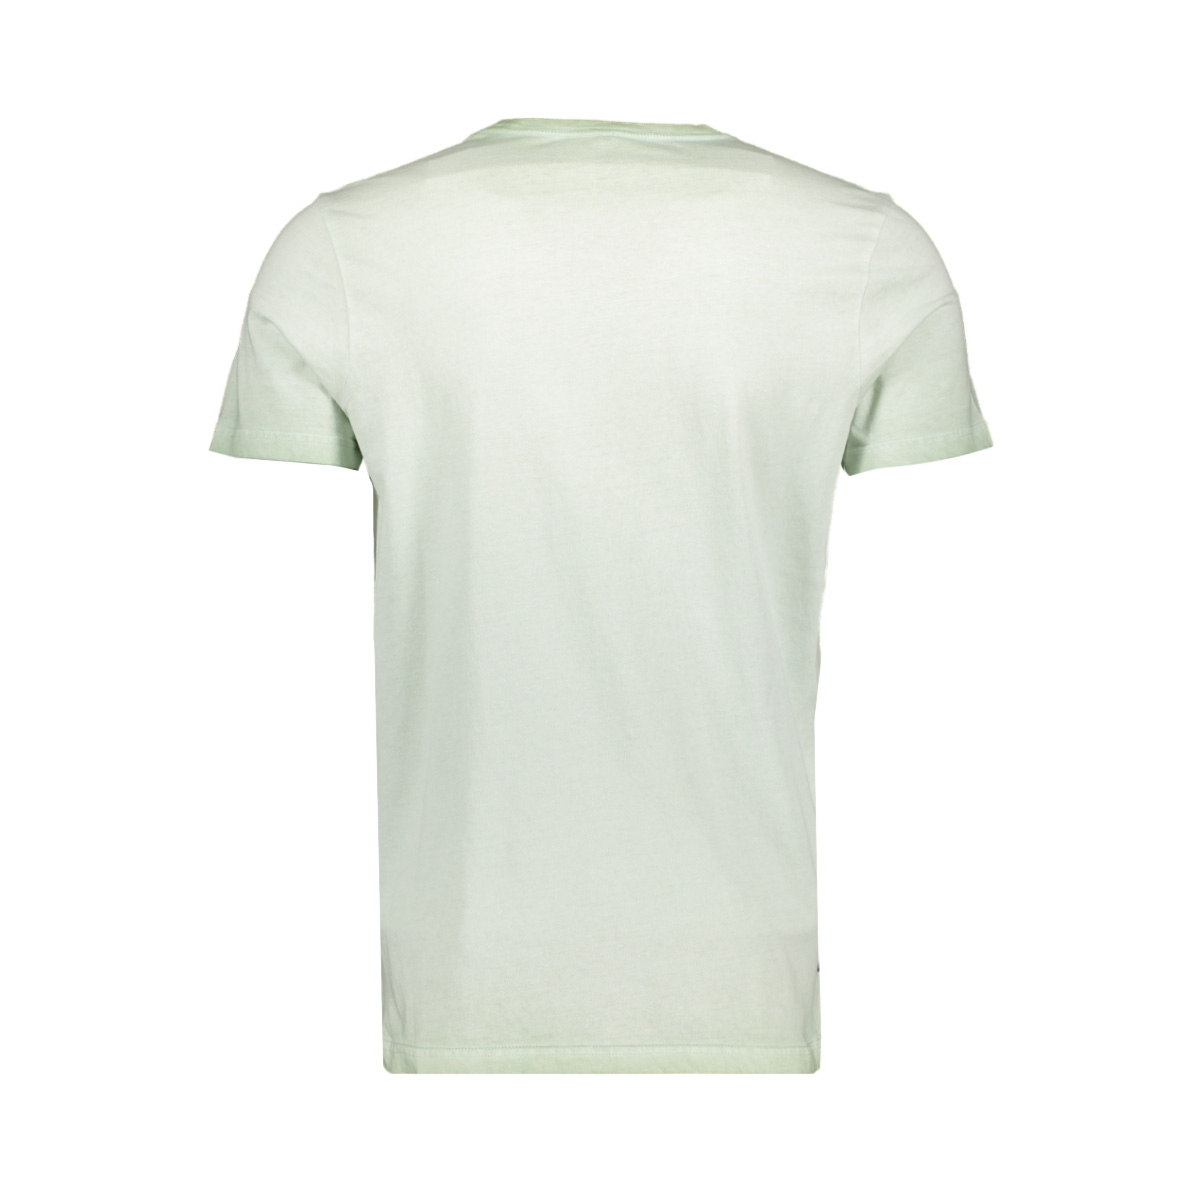 ptss191512 pme legend t-shirt 6174